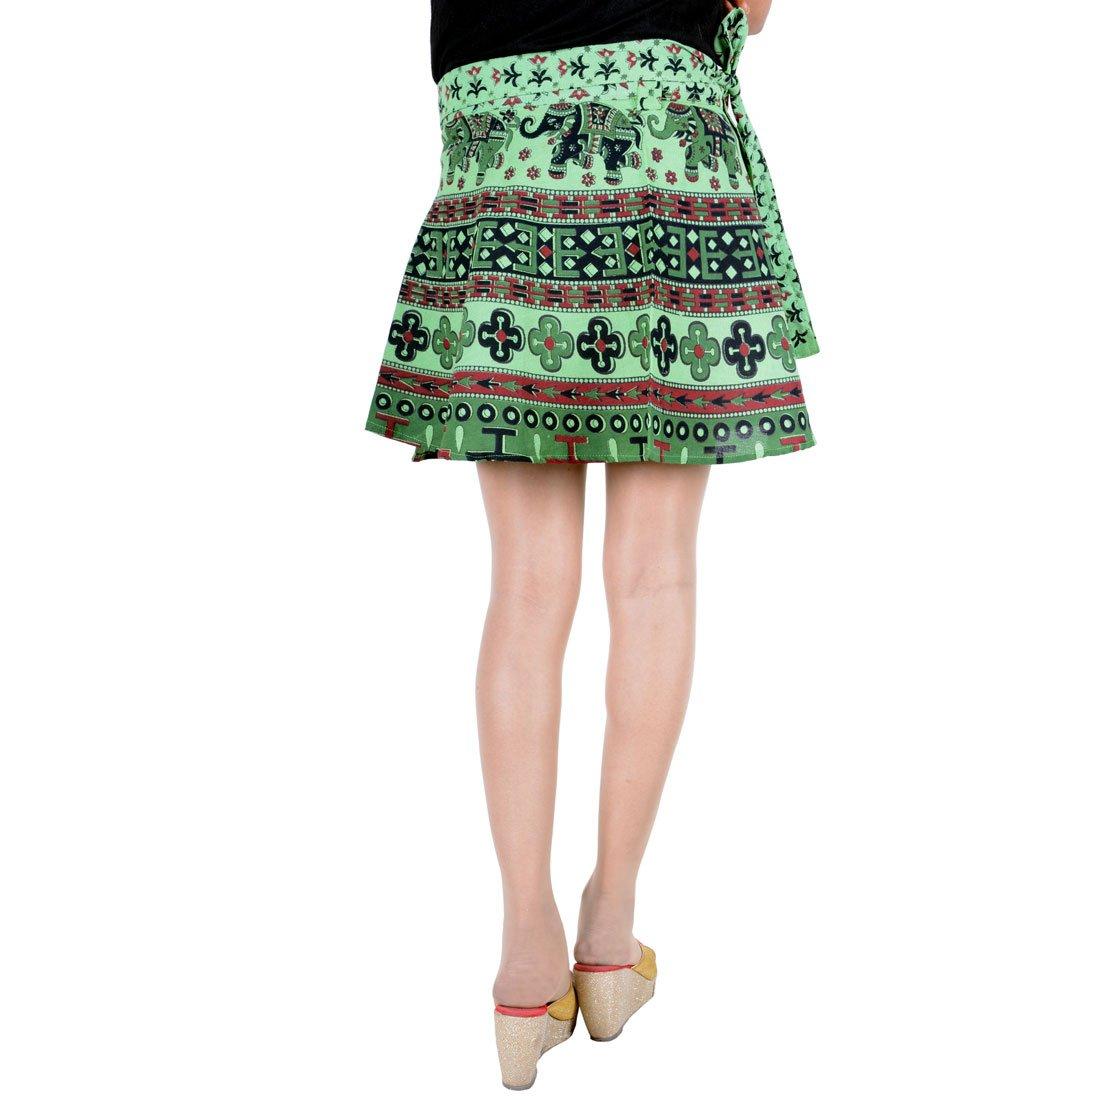 b7bc6ee4ea2 Skirt Indian Gypsy Hippy Short Mini Short Rapron Wraparound Skirt Women  Dress at Amazon Women s Clothing store